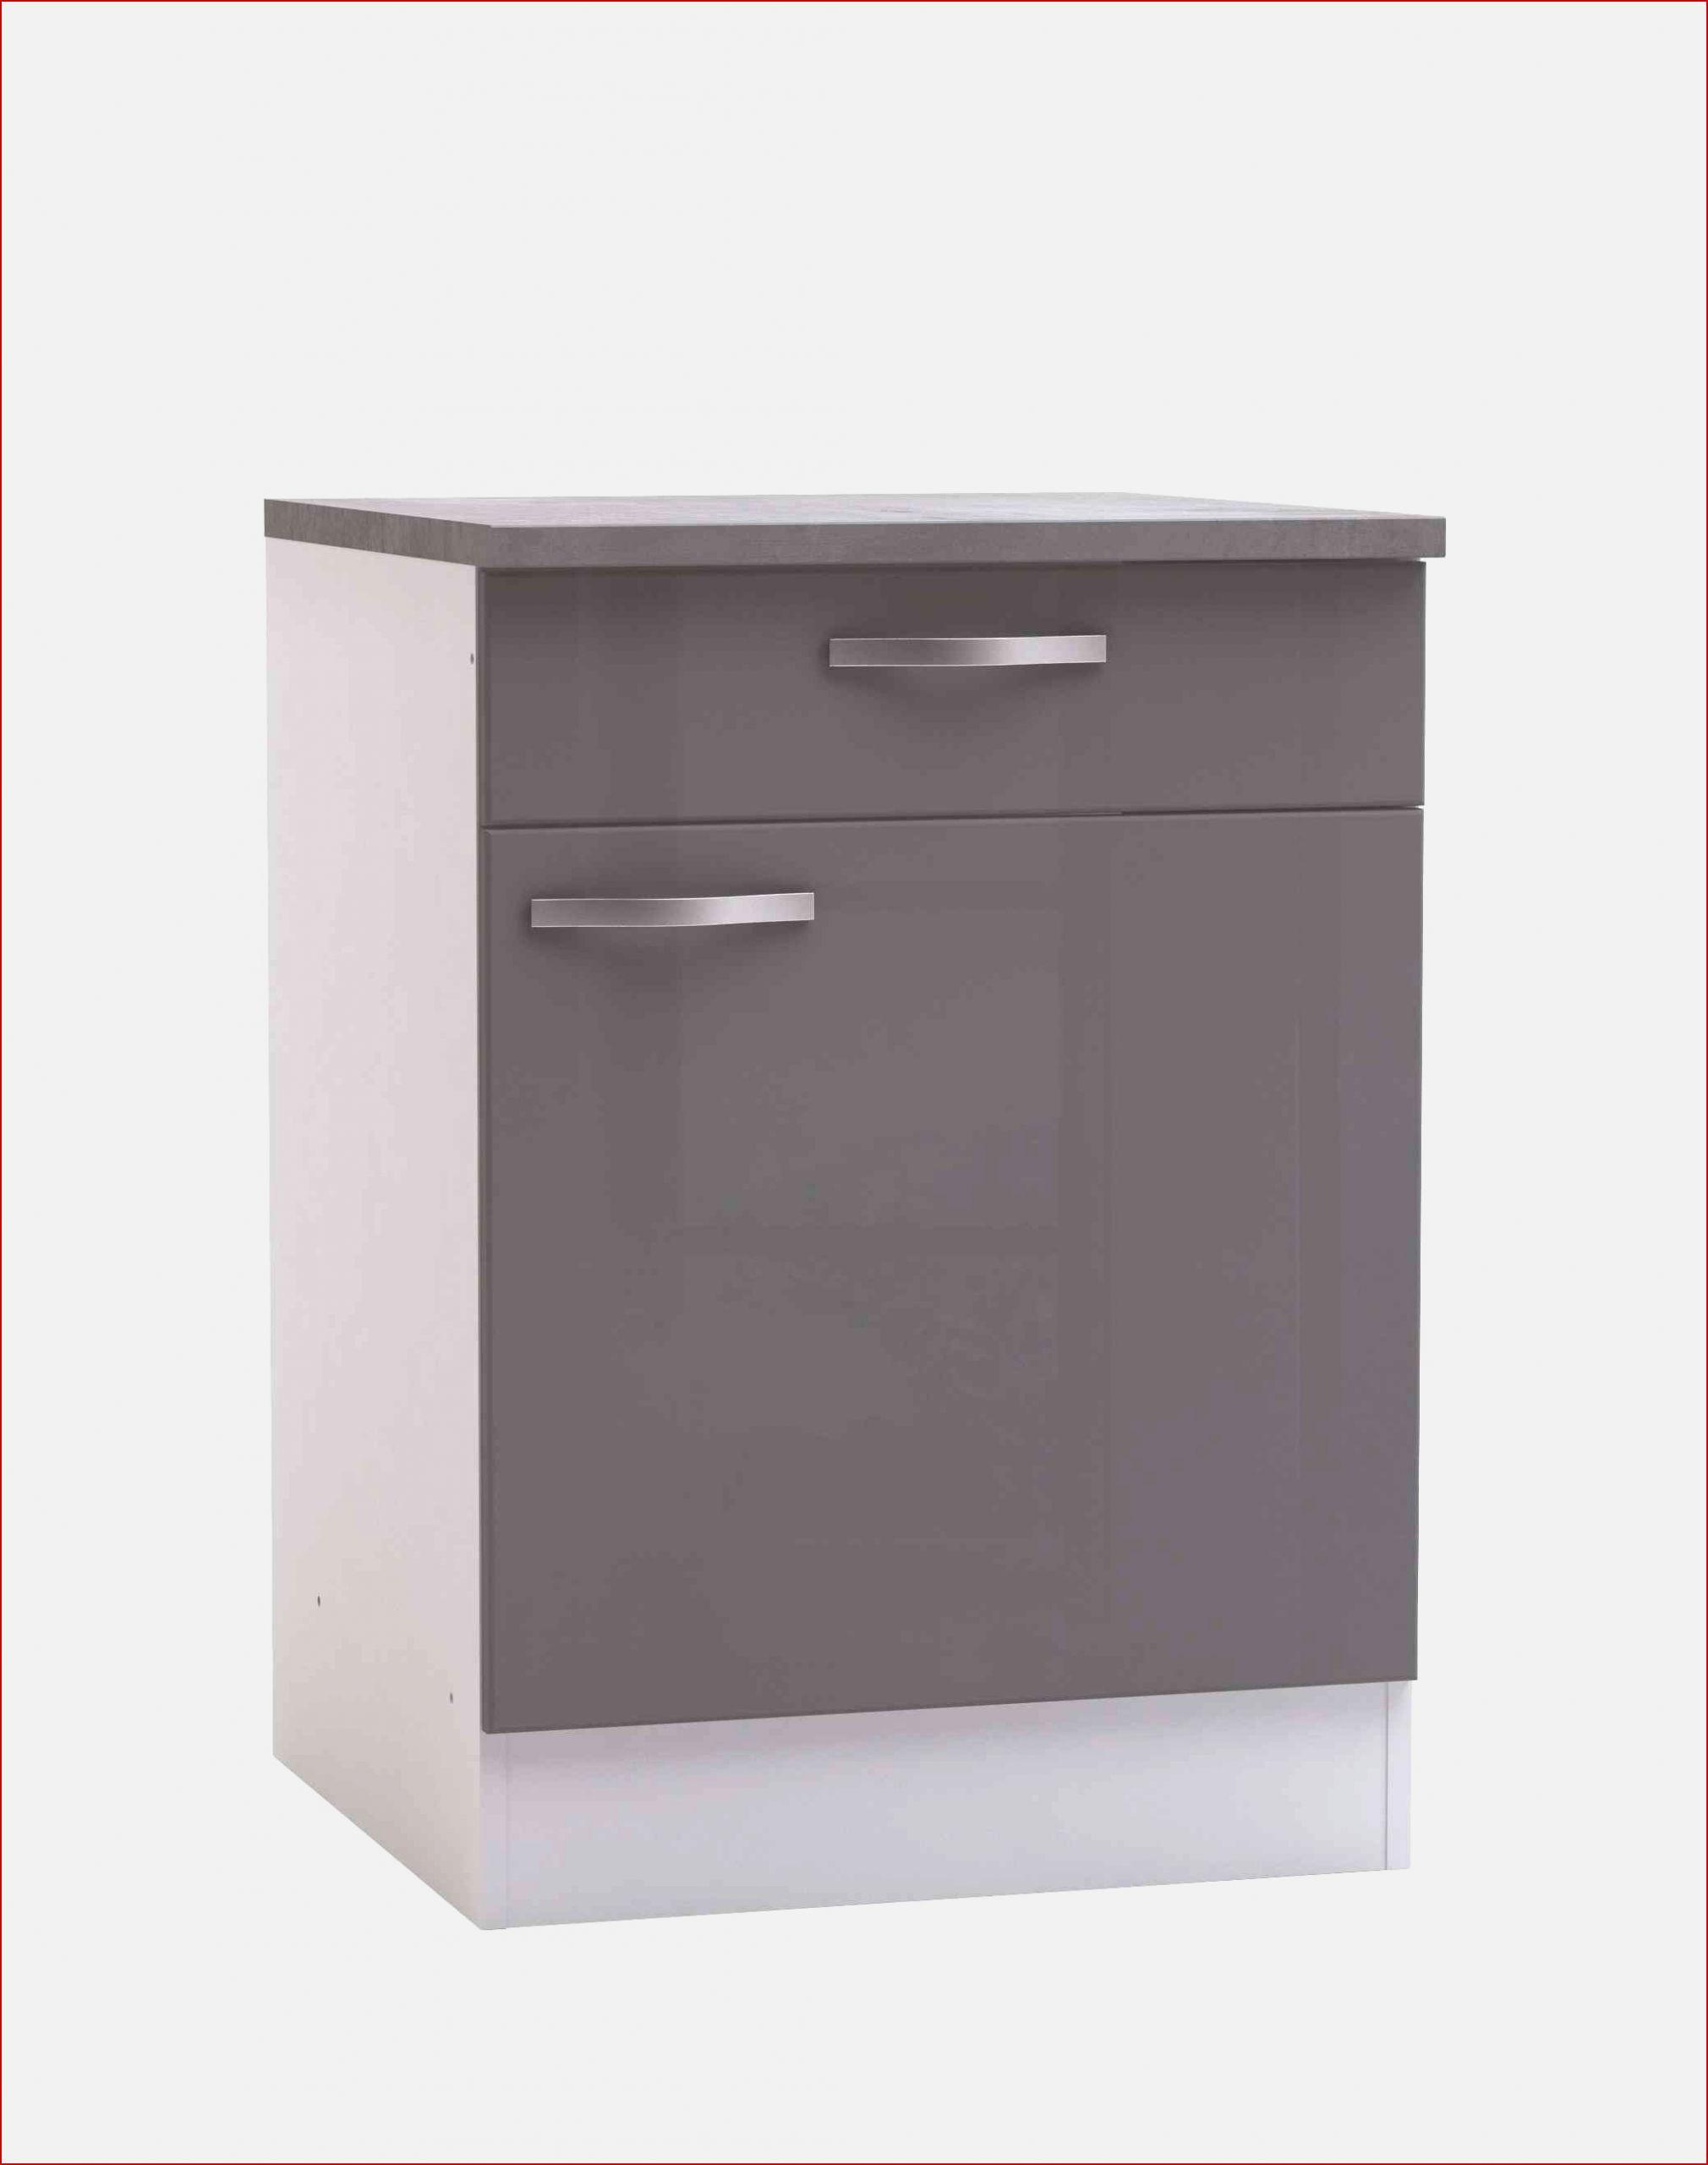 meuble pas cher meuble bas de salle de bain pas cher frais petit meuble bas cuisine of meuble pas cher